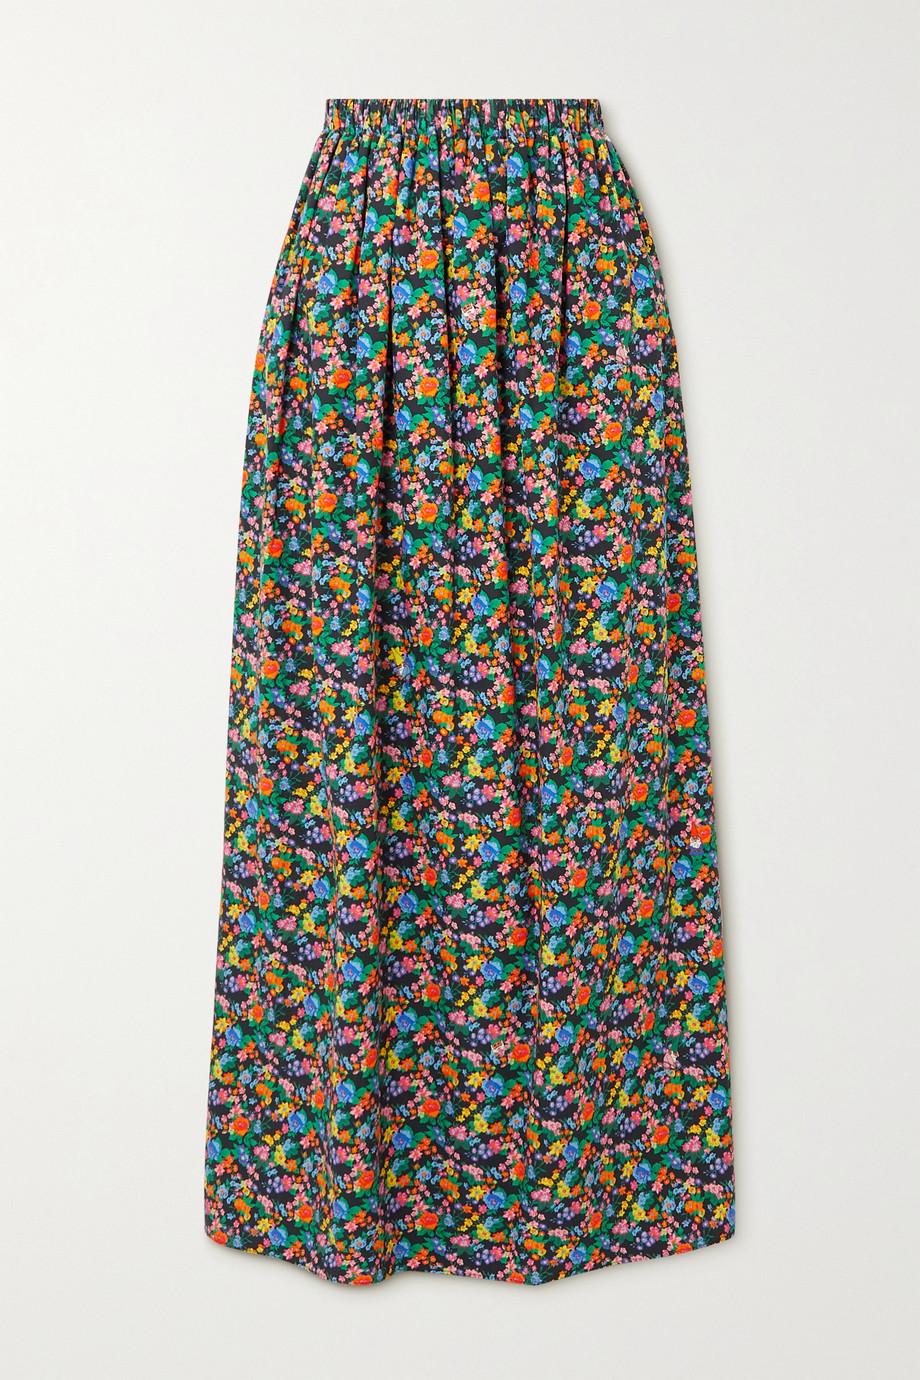 Tibi Sabine floral-print cotton-poplin maxi skirt